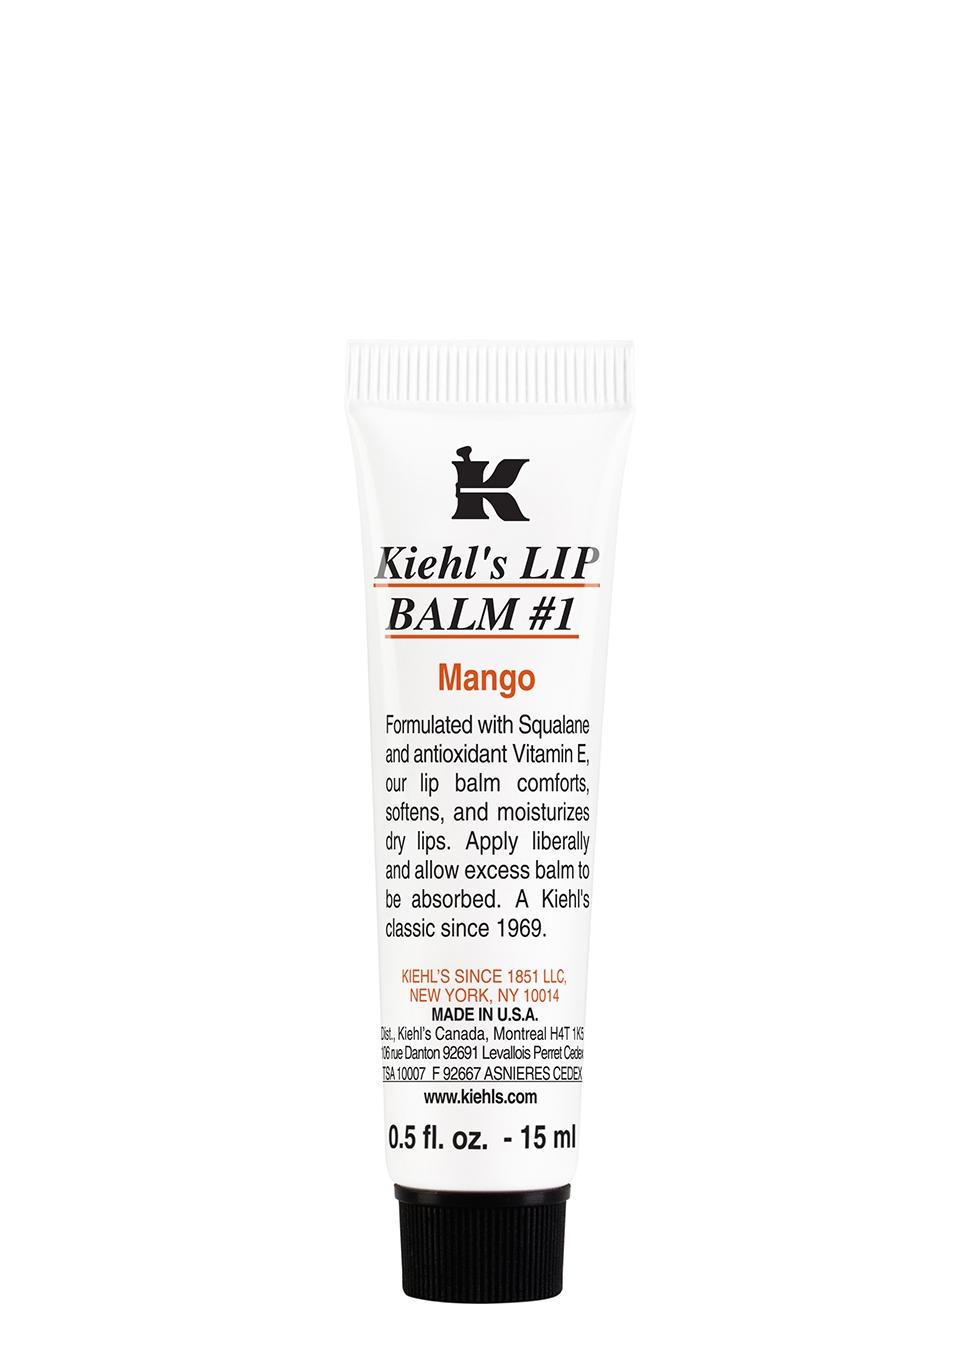 Scented Lip Balm #1 Mango 15ml